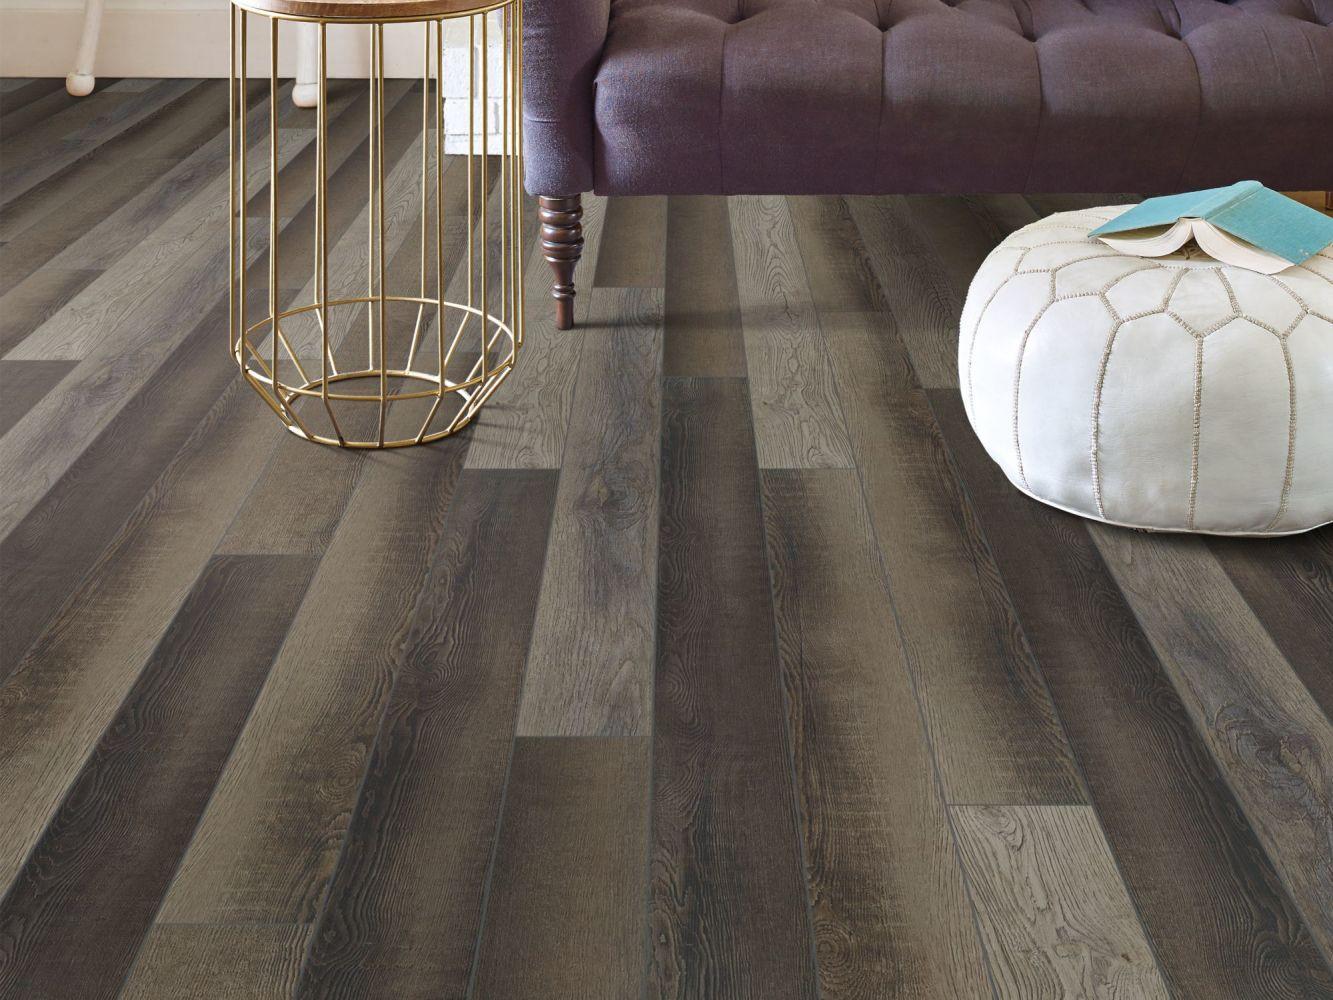 Shaw Floors Resilient Residential Grand Marais5″plus Blackfill Oak 00909_505GA